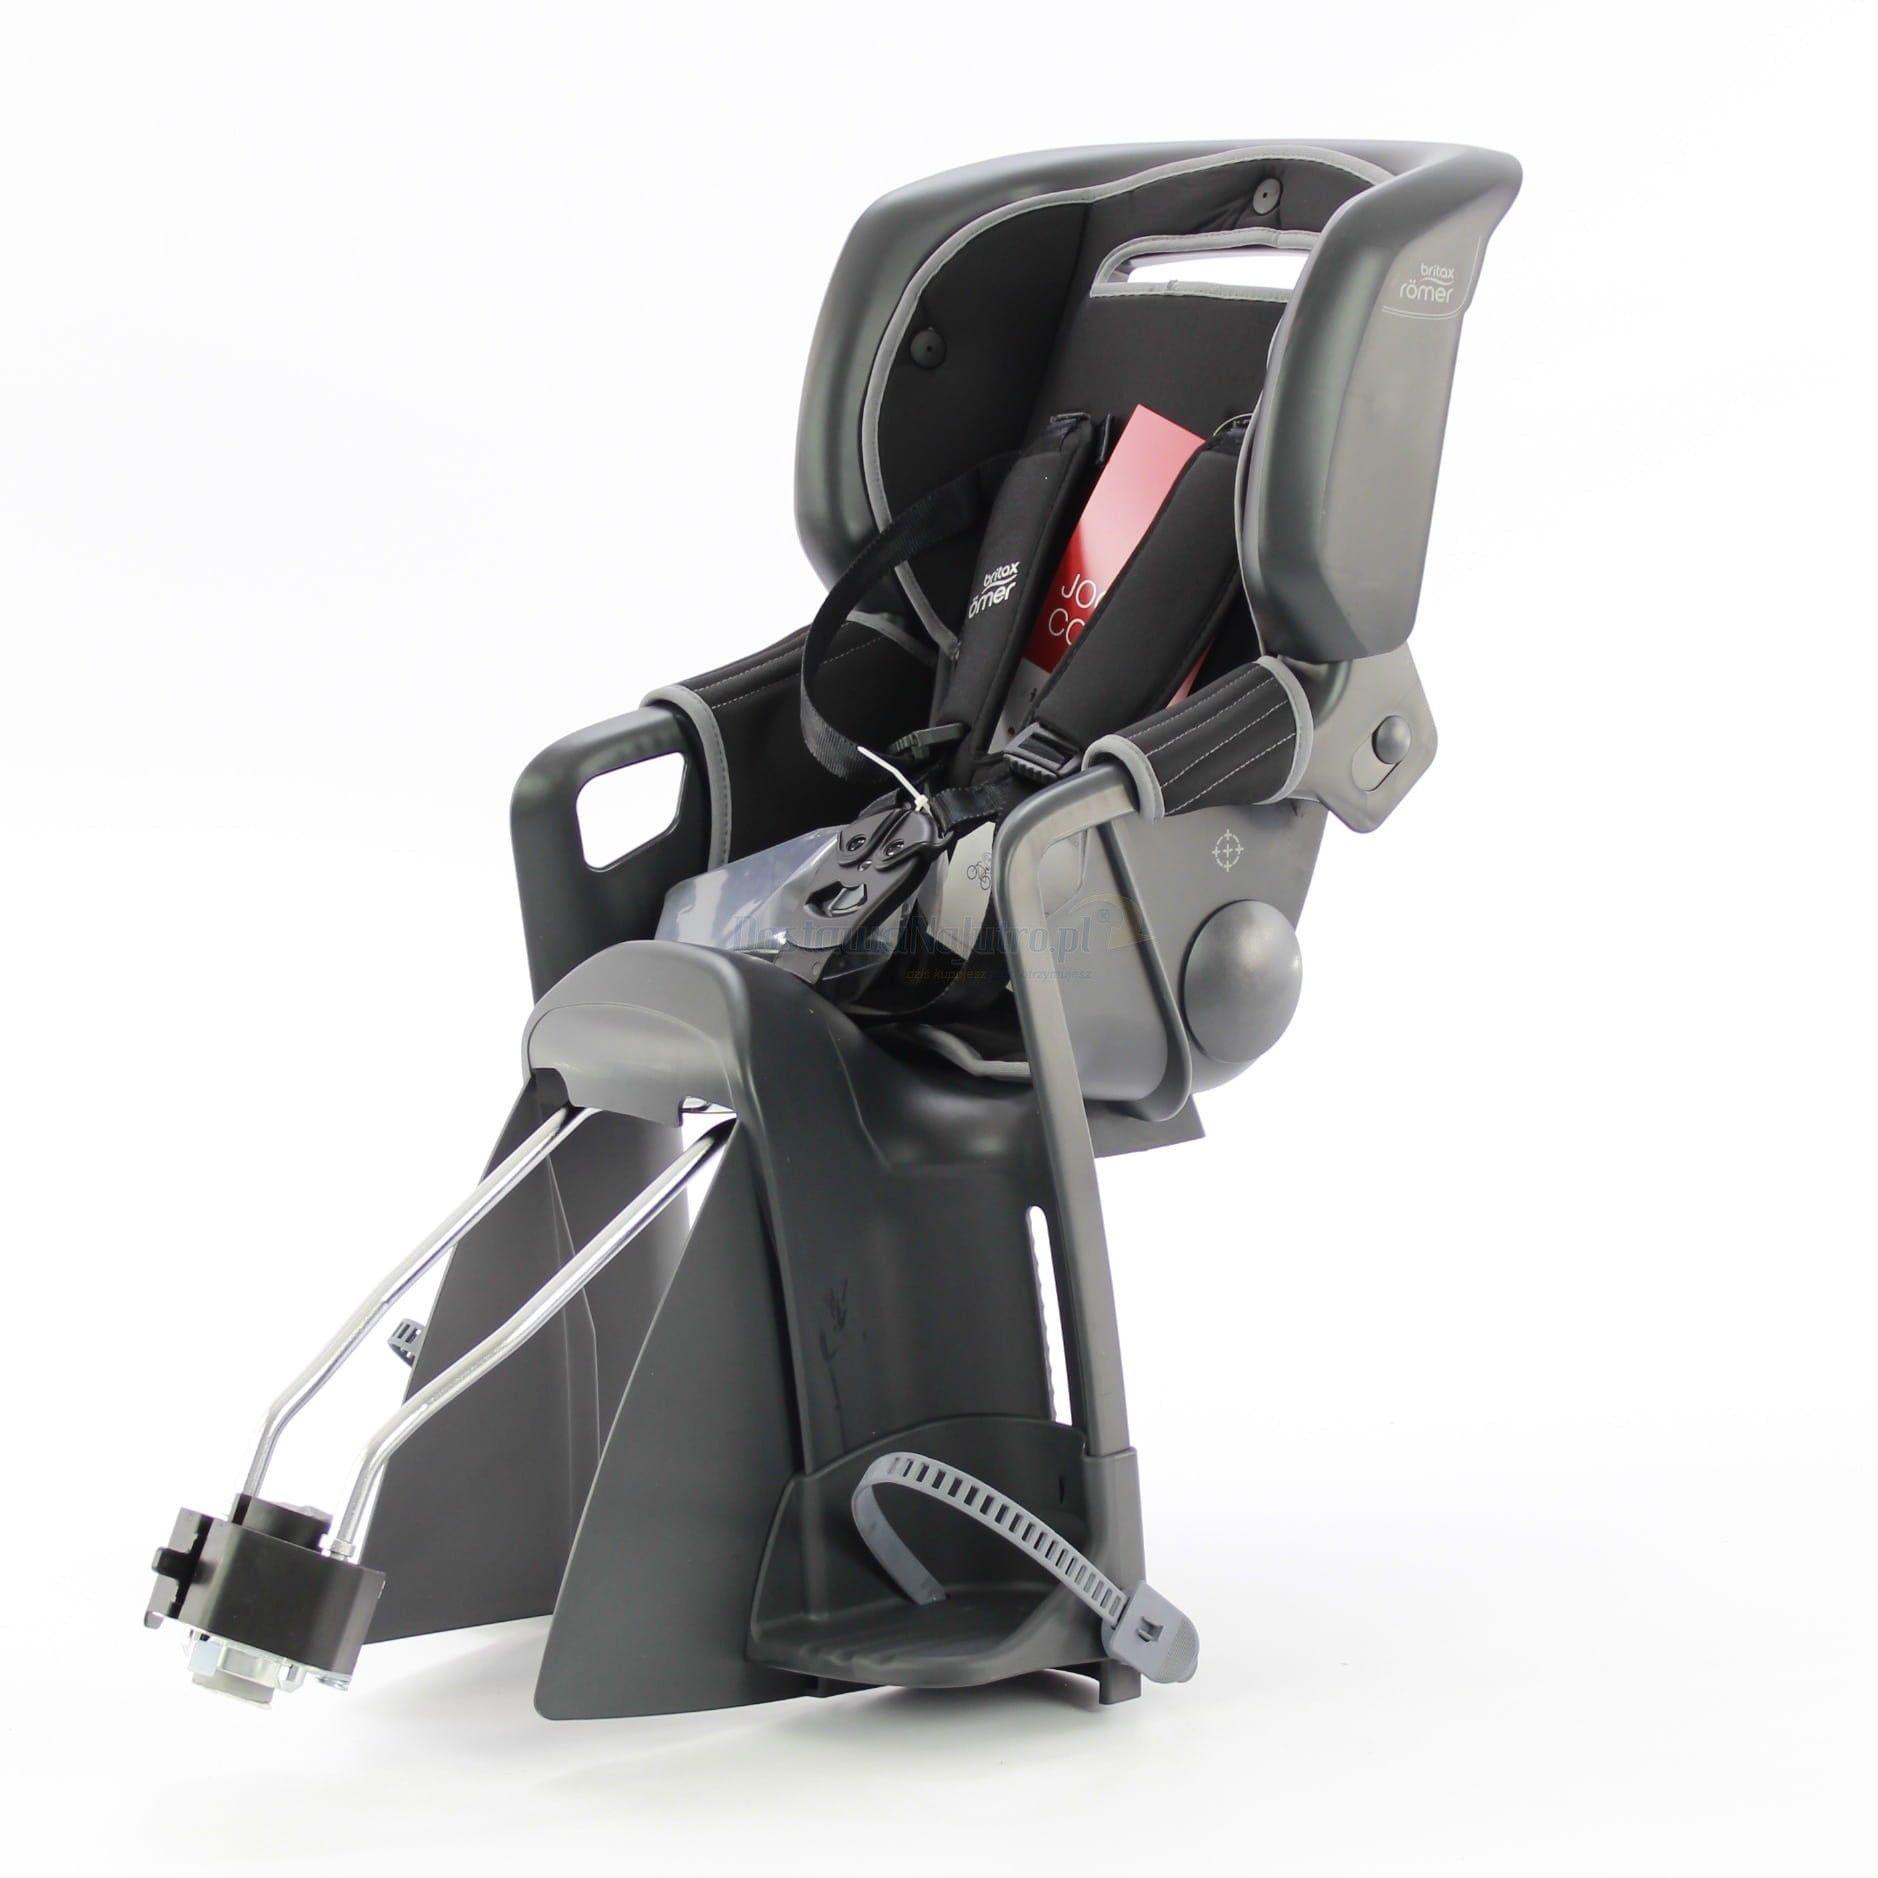 Fotelik rowerowy ROMER JOCKEY 3 COMFORT BRITAX- kolor szaro-czarny 2020